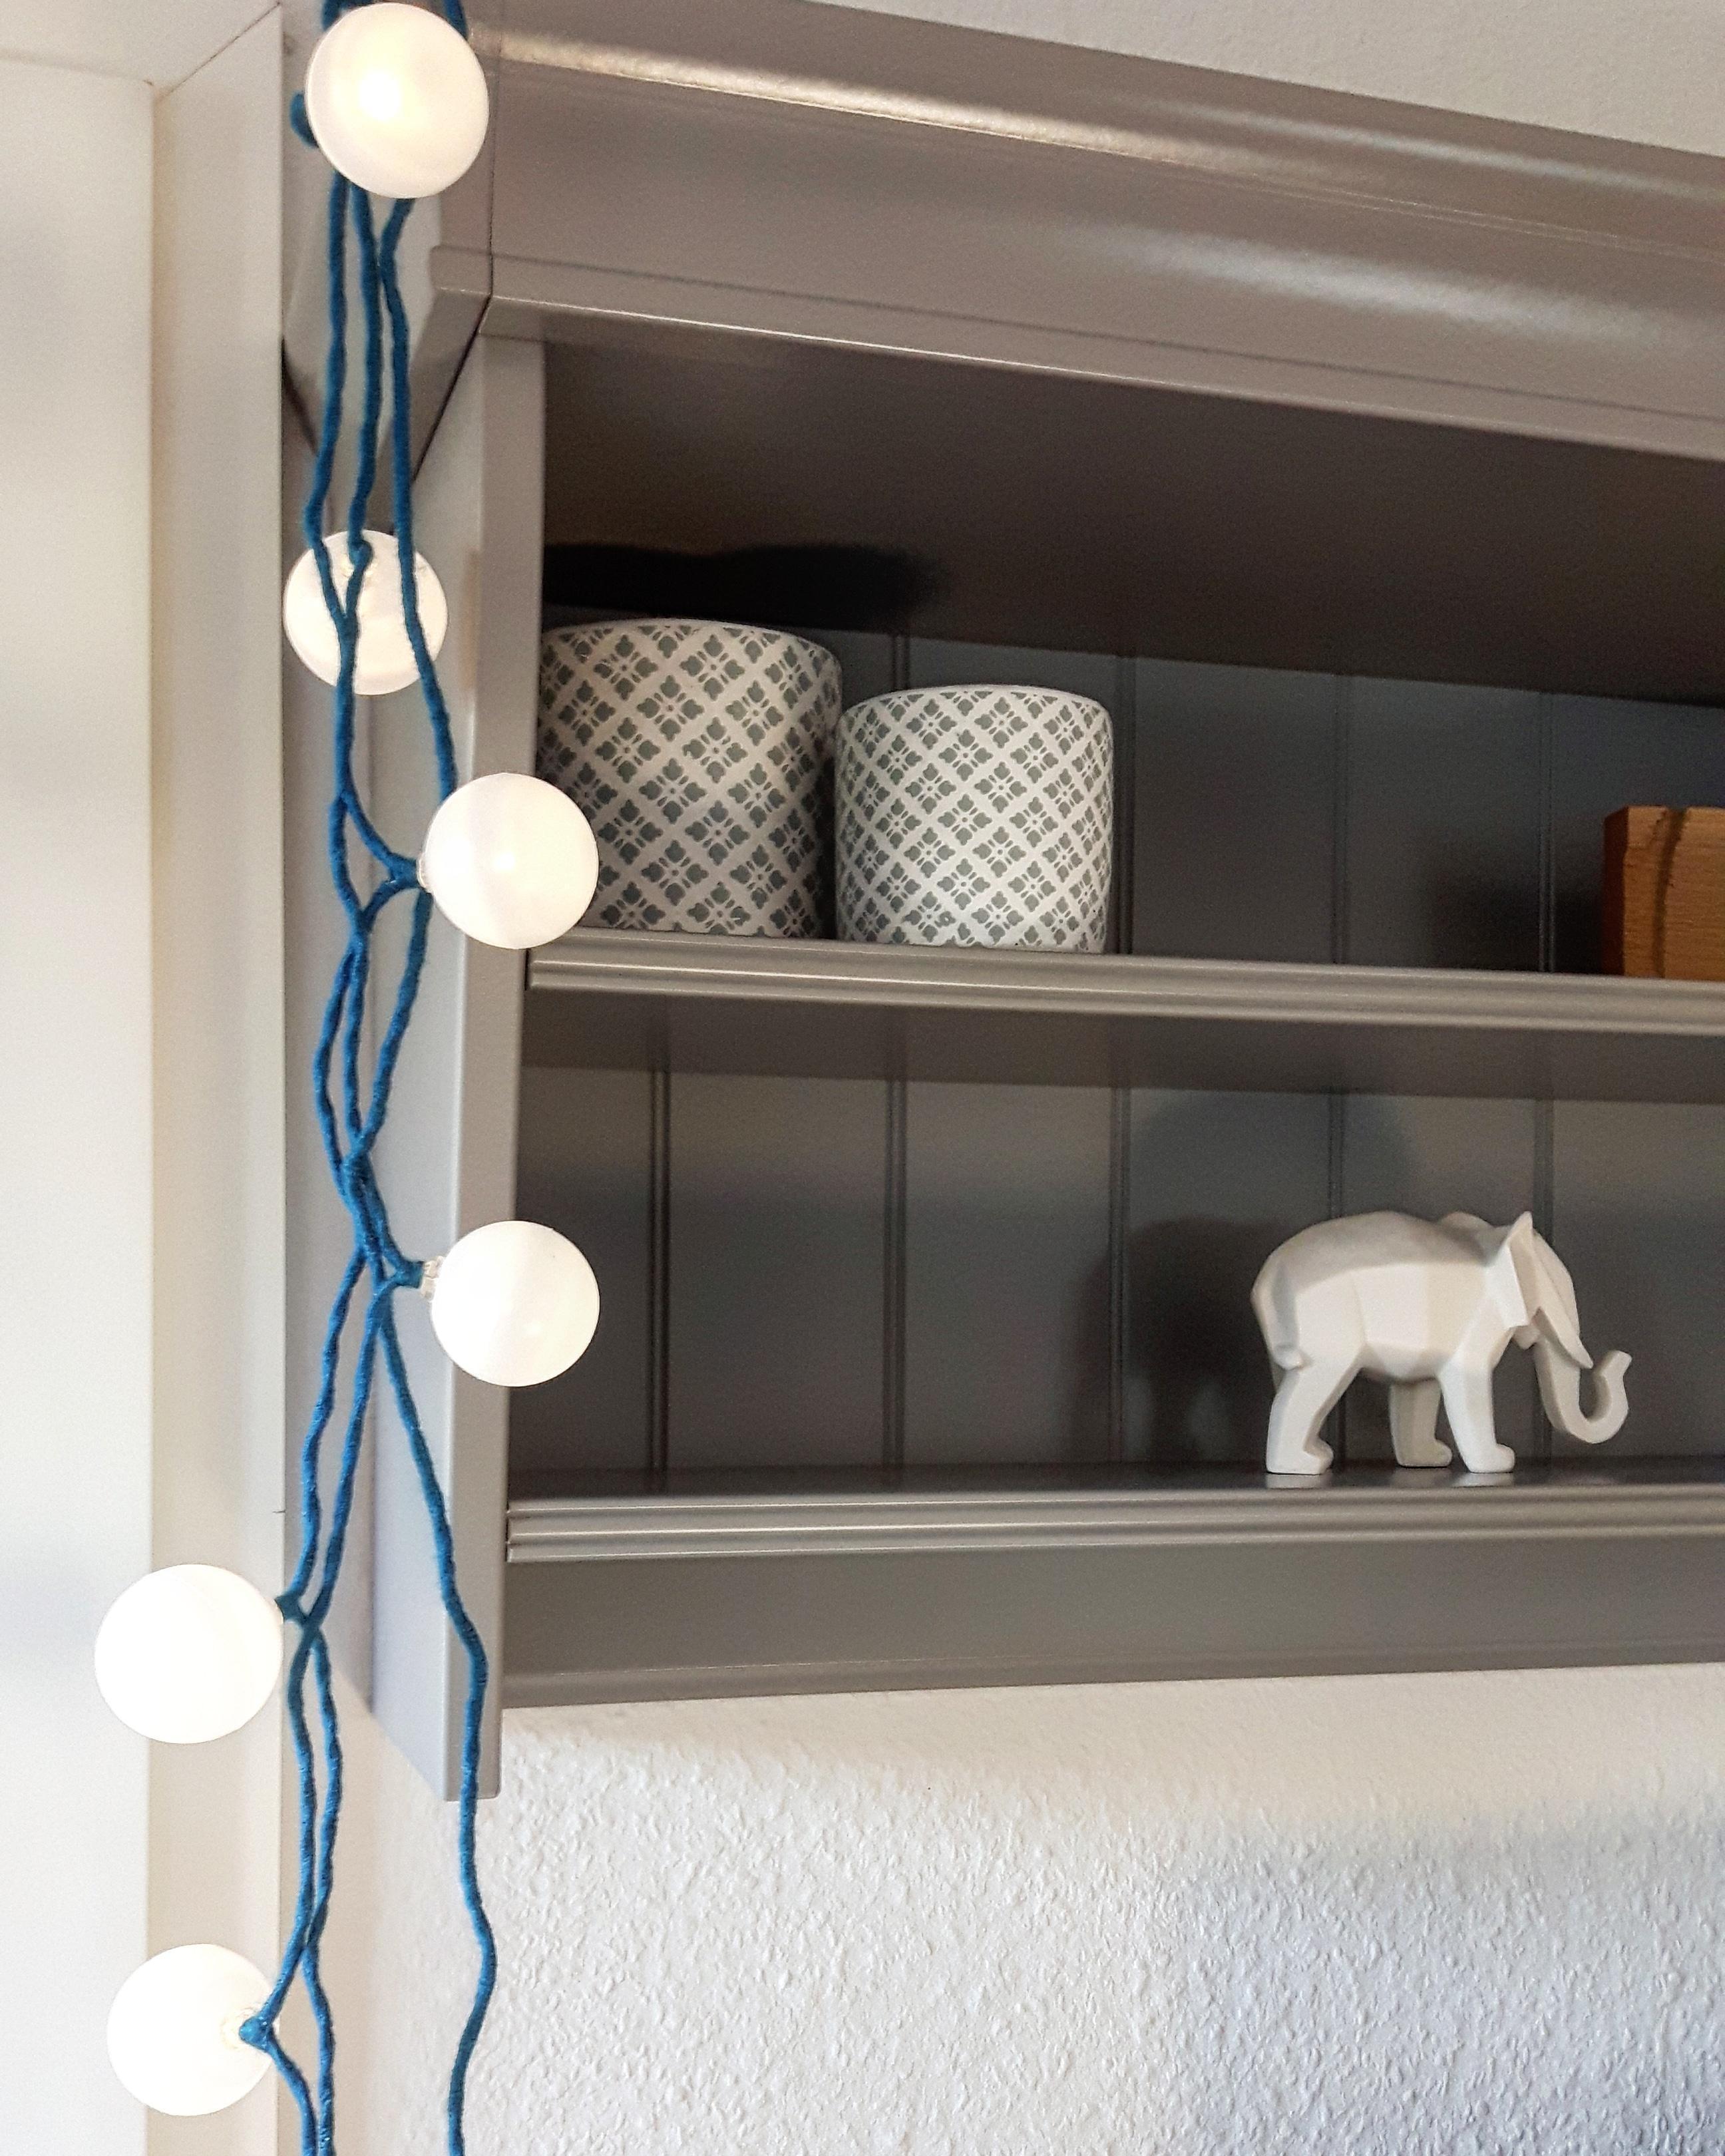 #lichterkette #diy #wandregal #licht #elefant #grau #weiss #pflanztöpfe